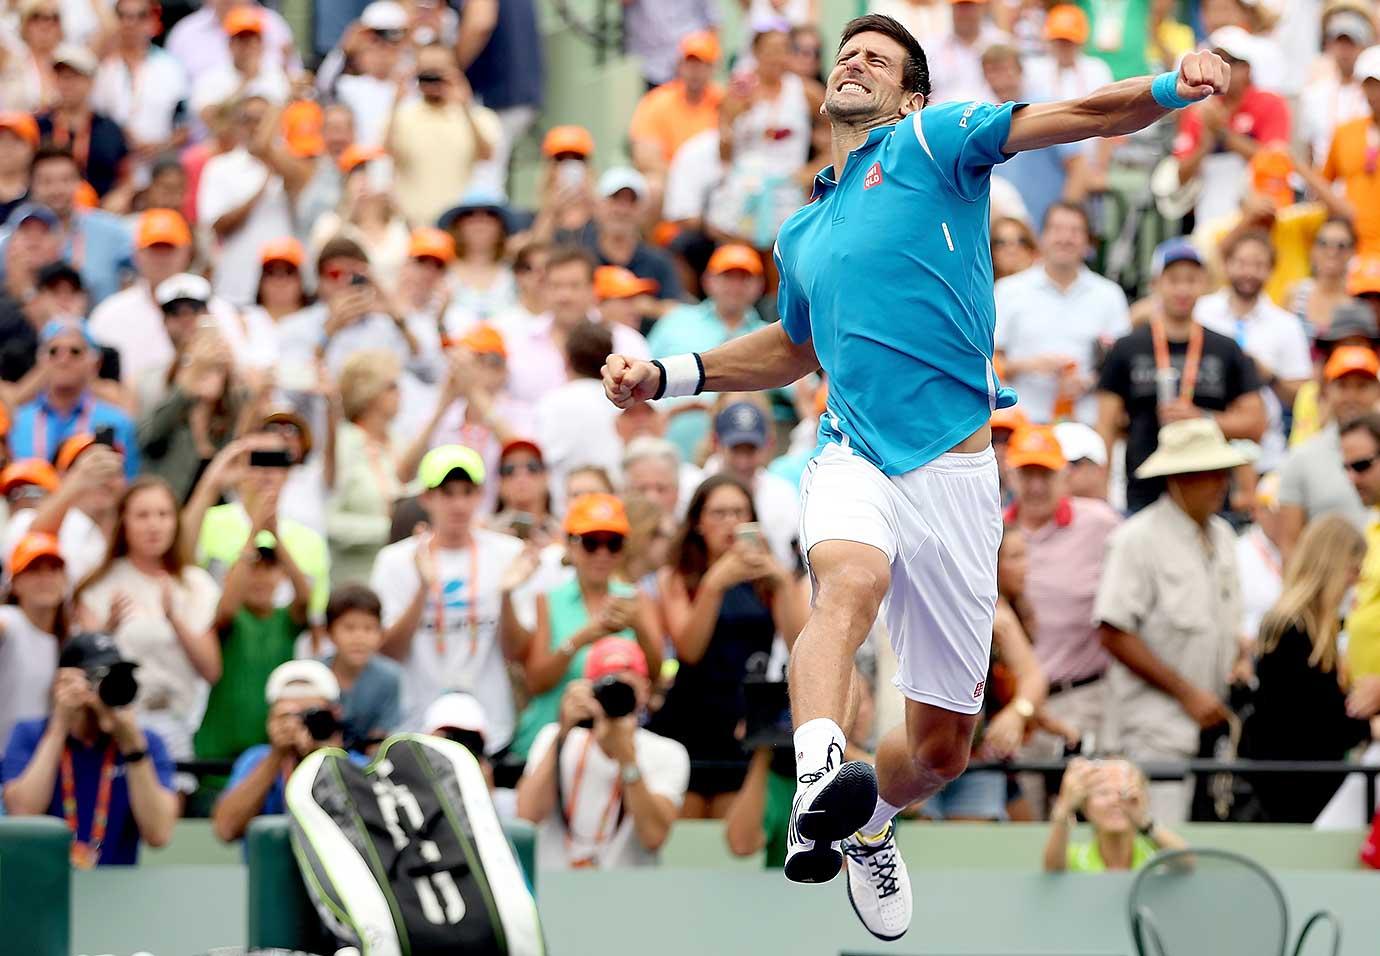 Novak Djokovic celebrates his win over Kei Nishikori of Japan in the championship match of the Miami Open.